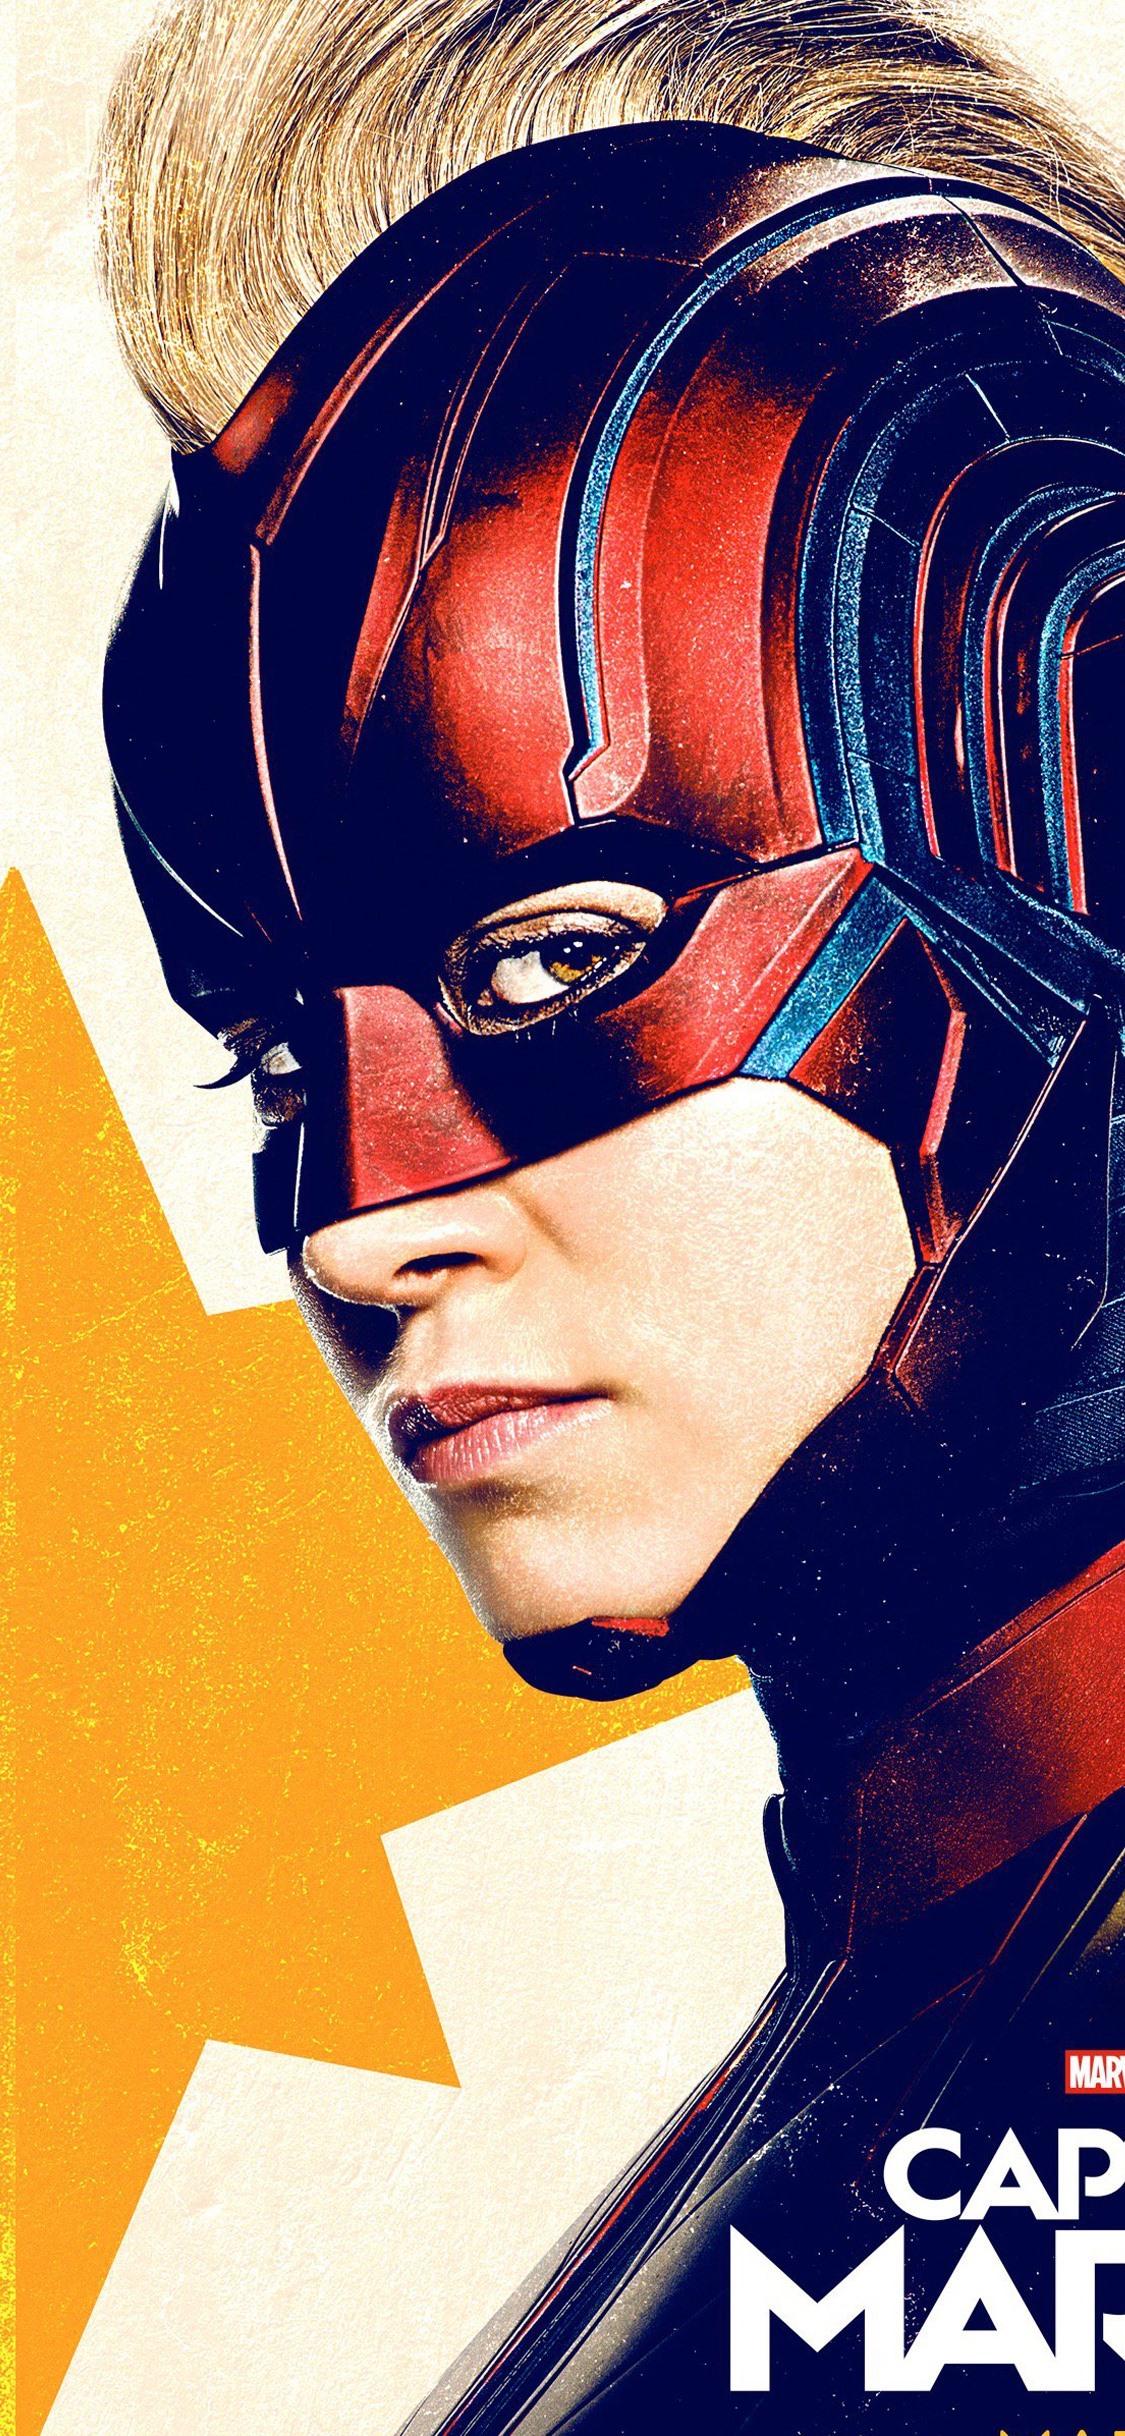 Captain Marvel Girl Superhero 1125x2436 Iphone 11 Pro Xs X Wallpaper Background Picture Image